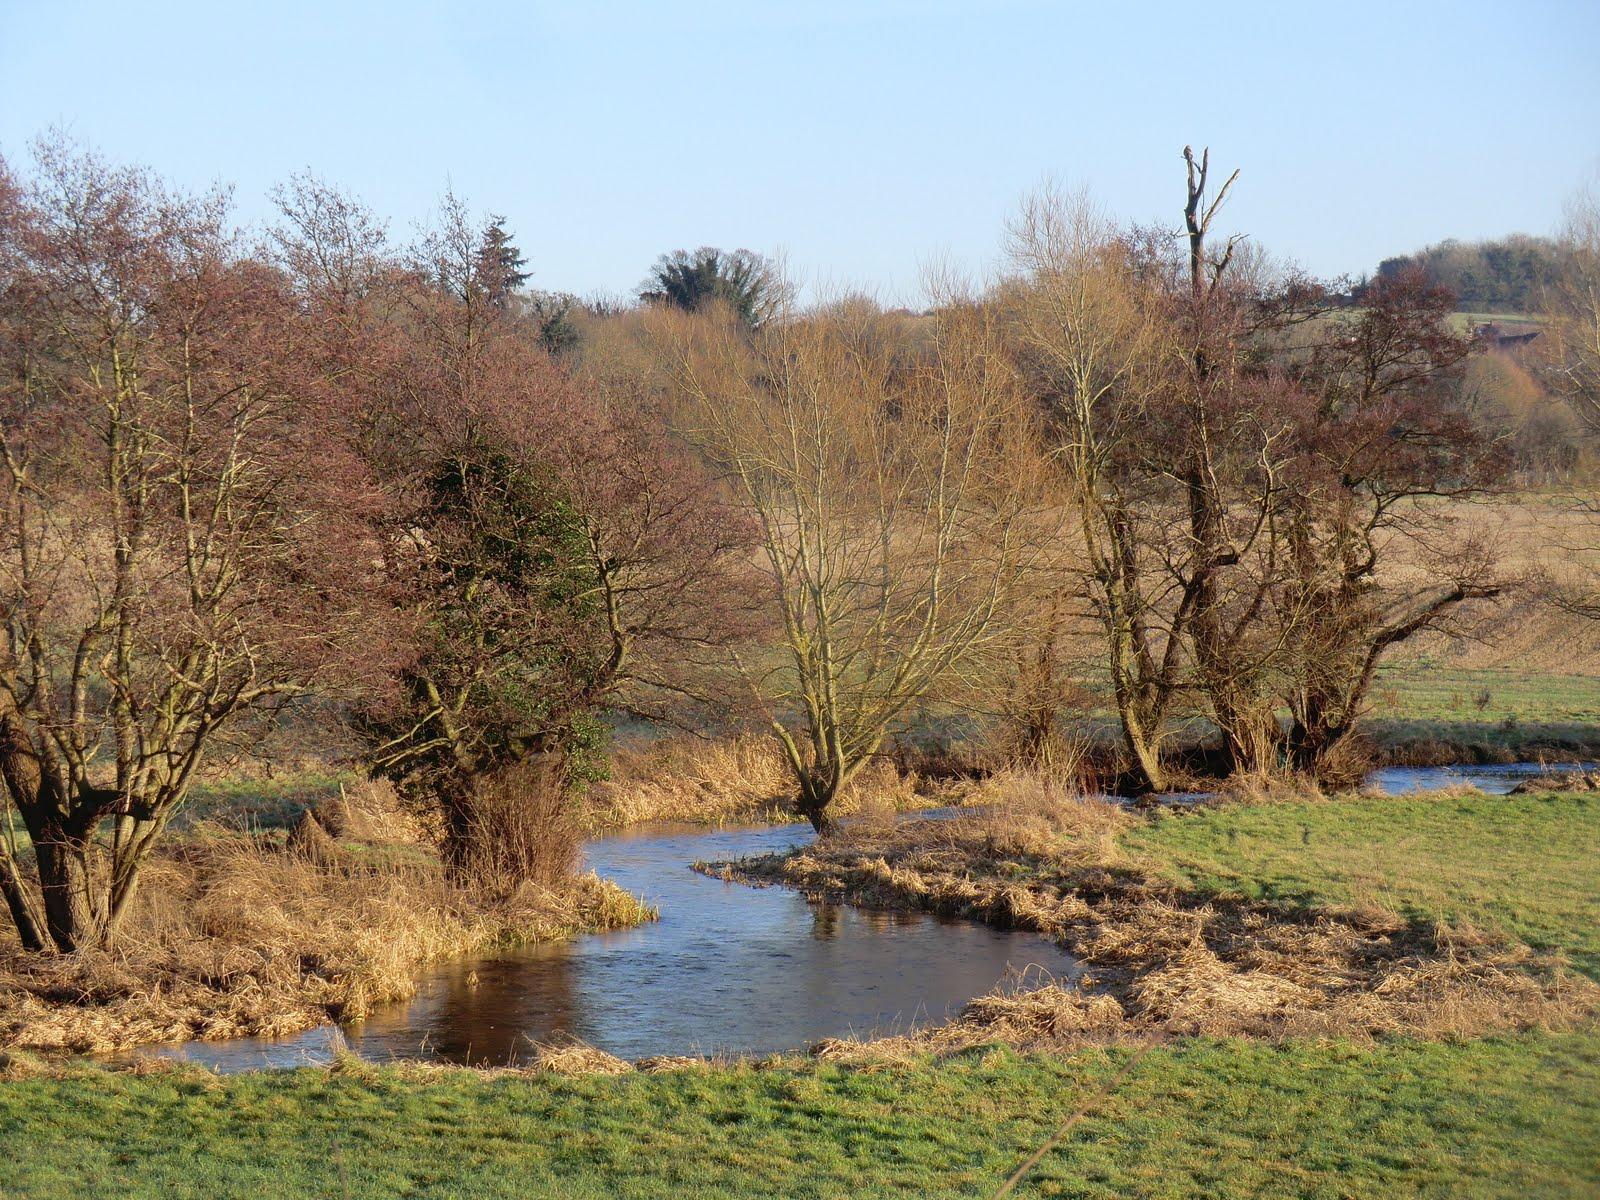 CIMG8402 River Darent near Eynsford